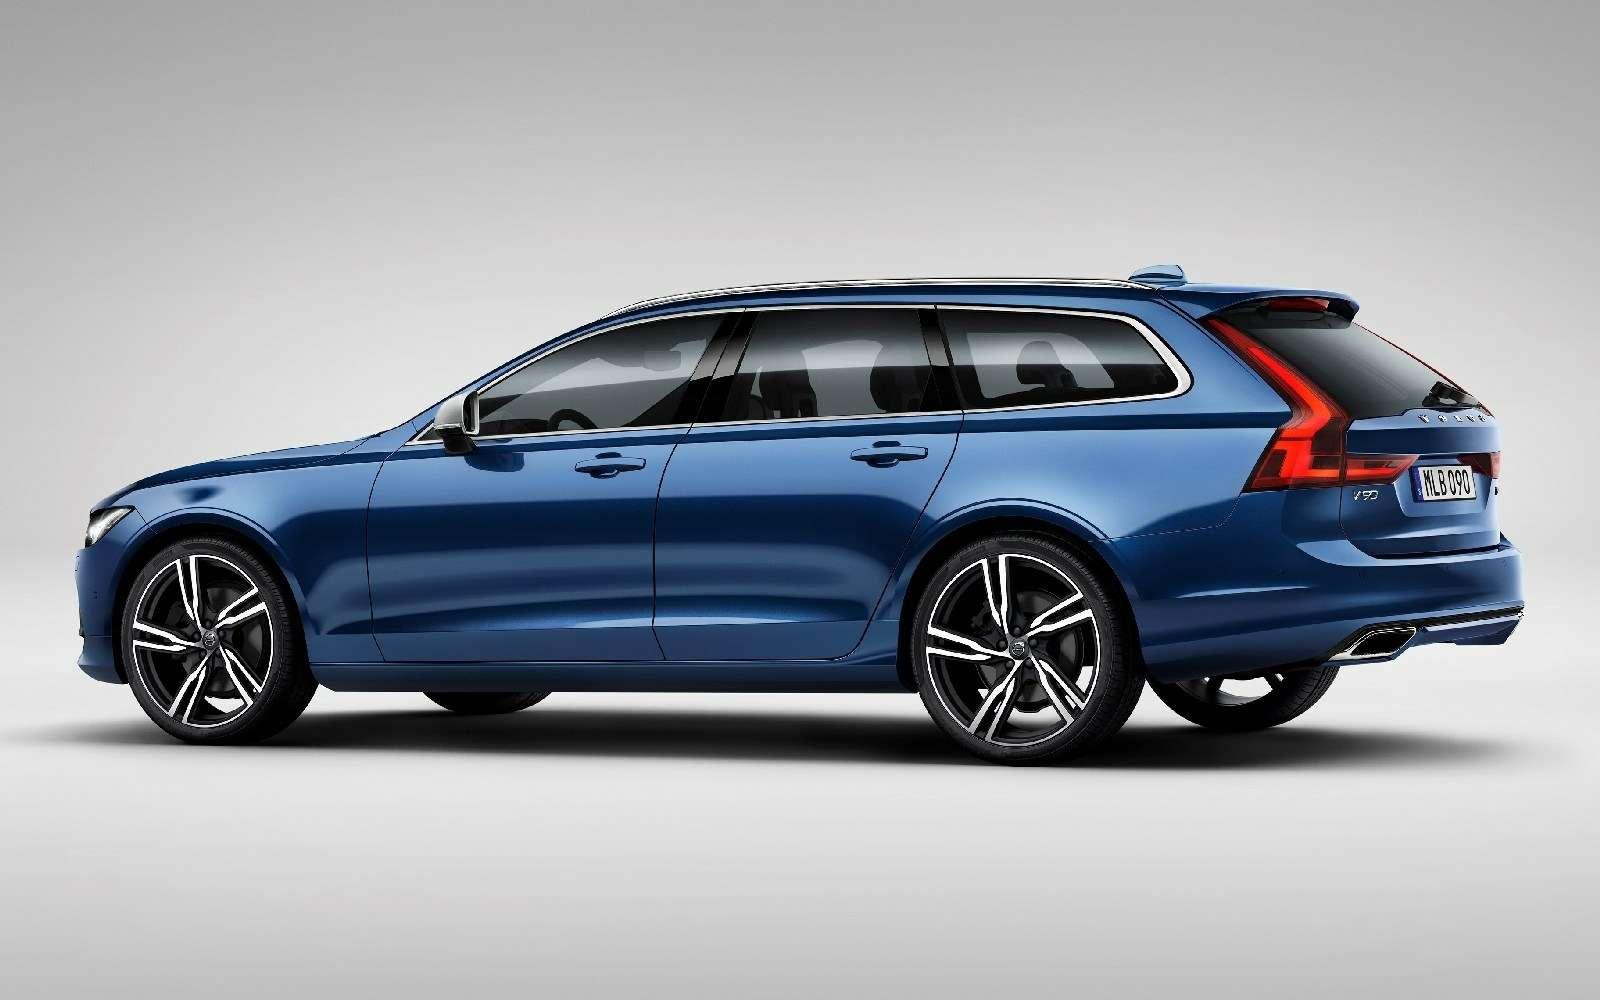 Volvo подготовила дляфлагманской модели спортпакет R-Design— фото 600928